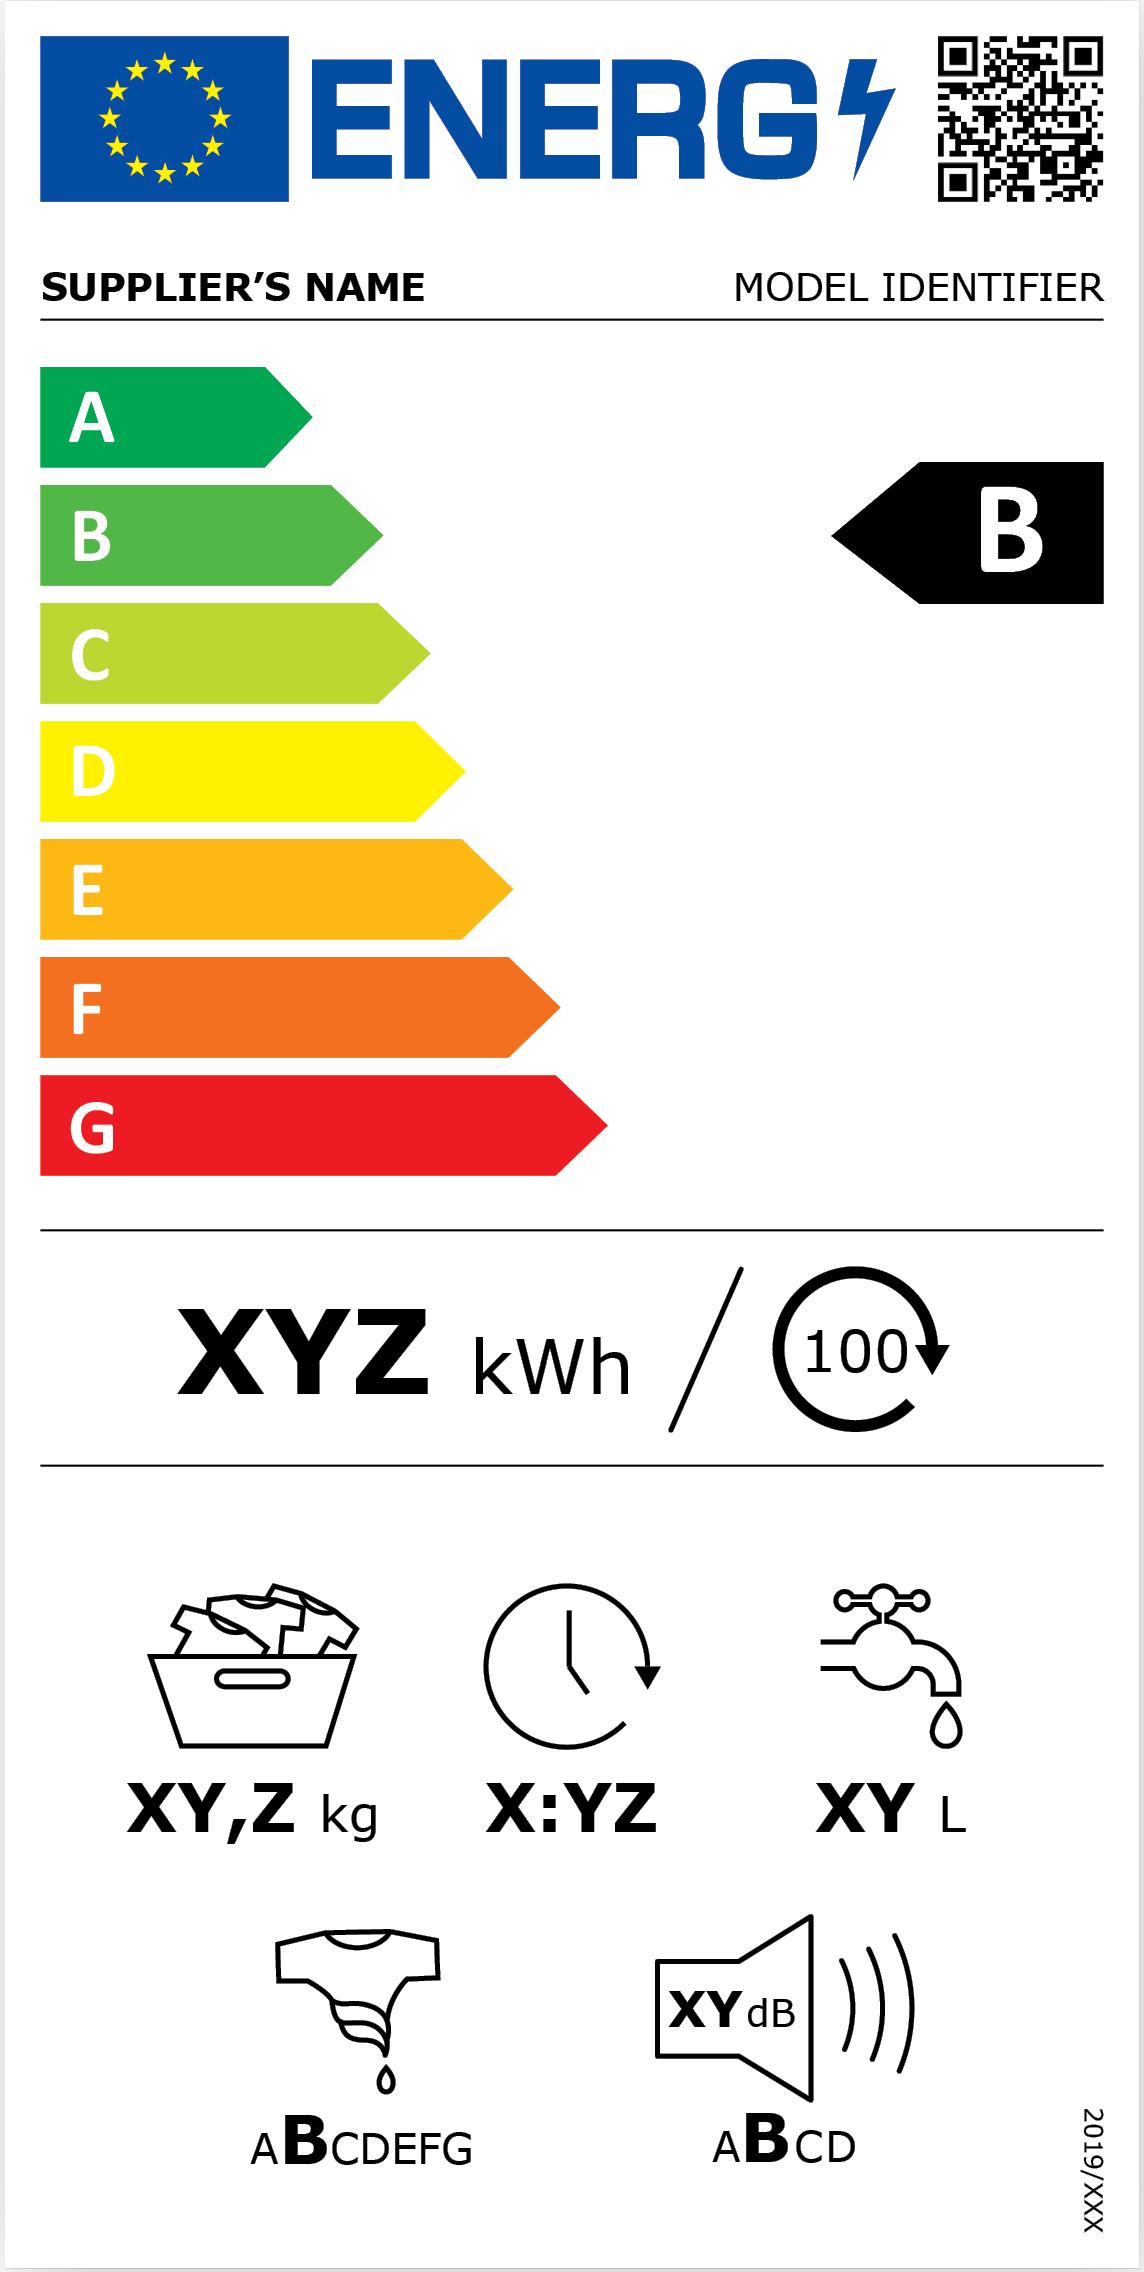 Zobrazení nového energetického štítku pro pračky